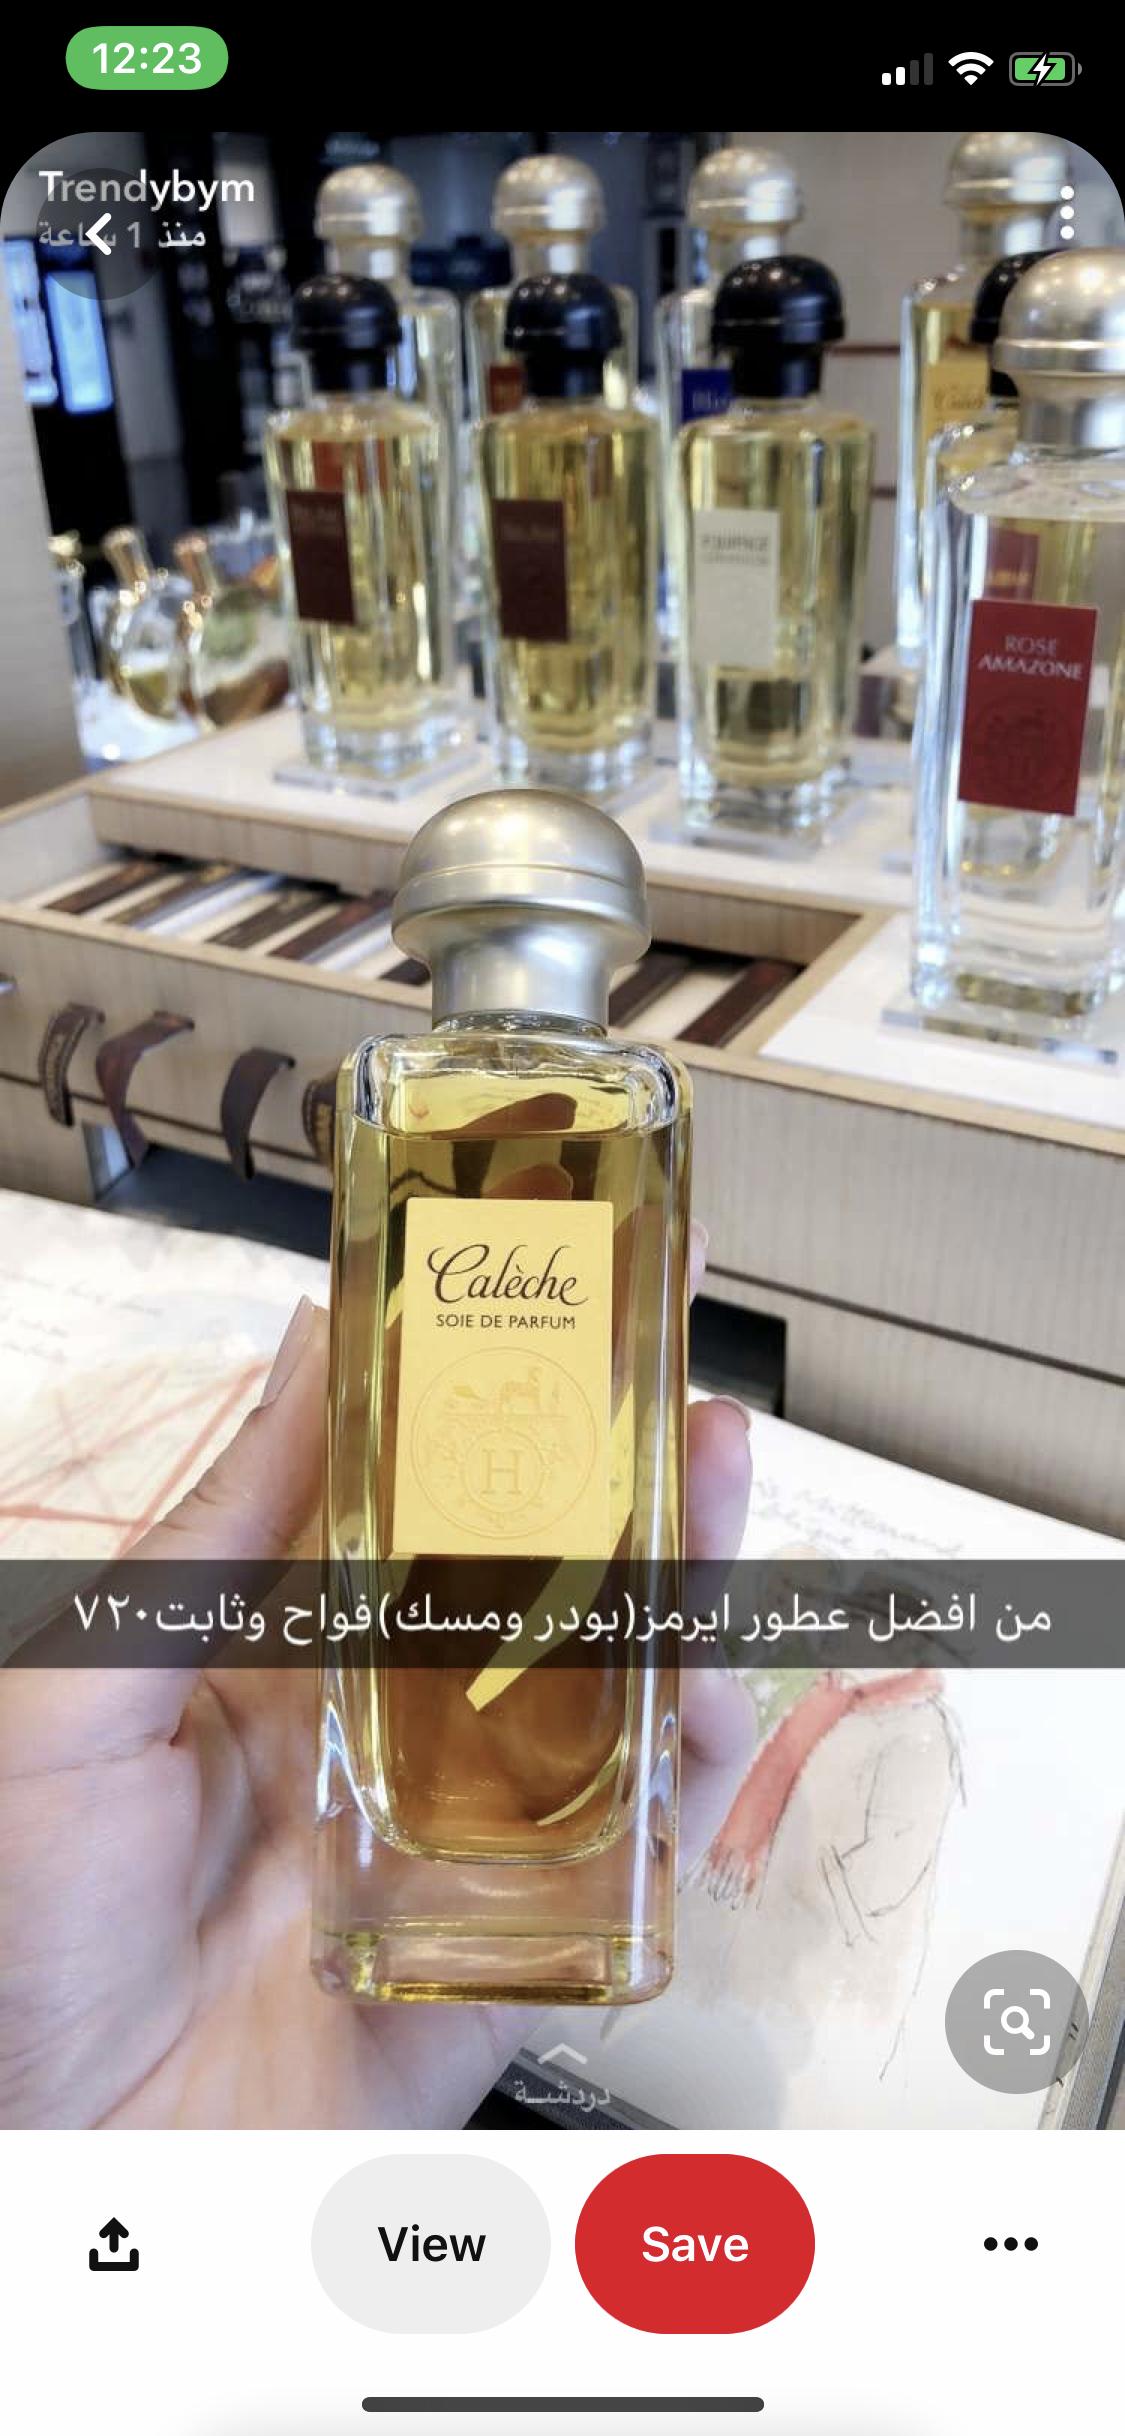 Pin By Samar Anan On عطور فرنسية Perfume Gift Perfume Cheap Perfume